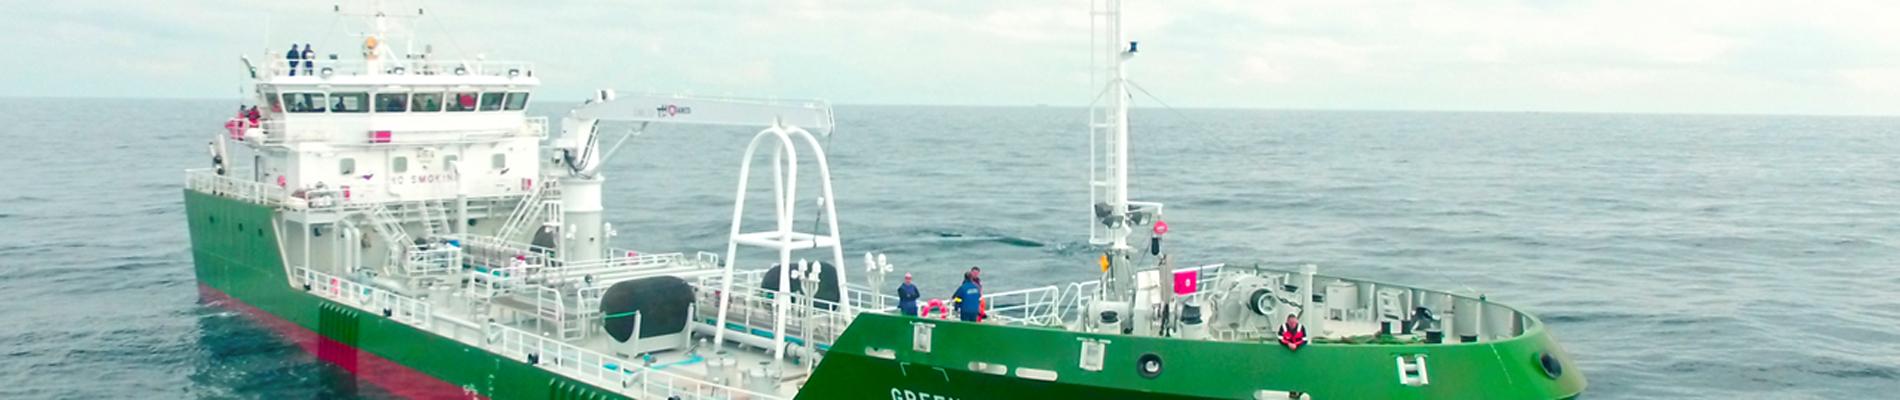 Transporte marítimo internacional